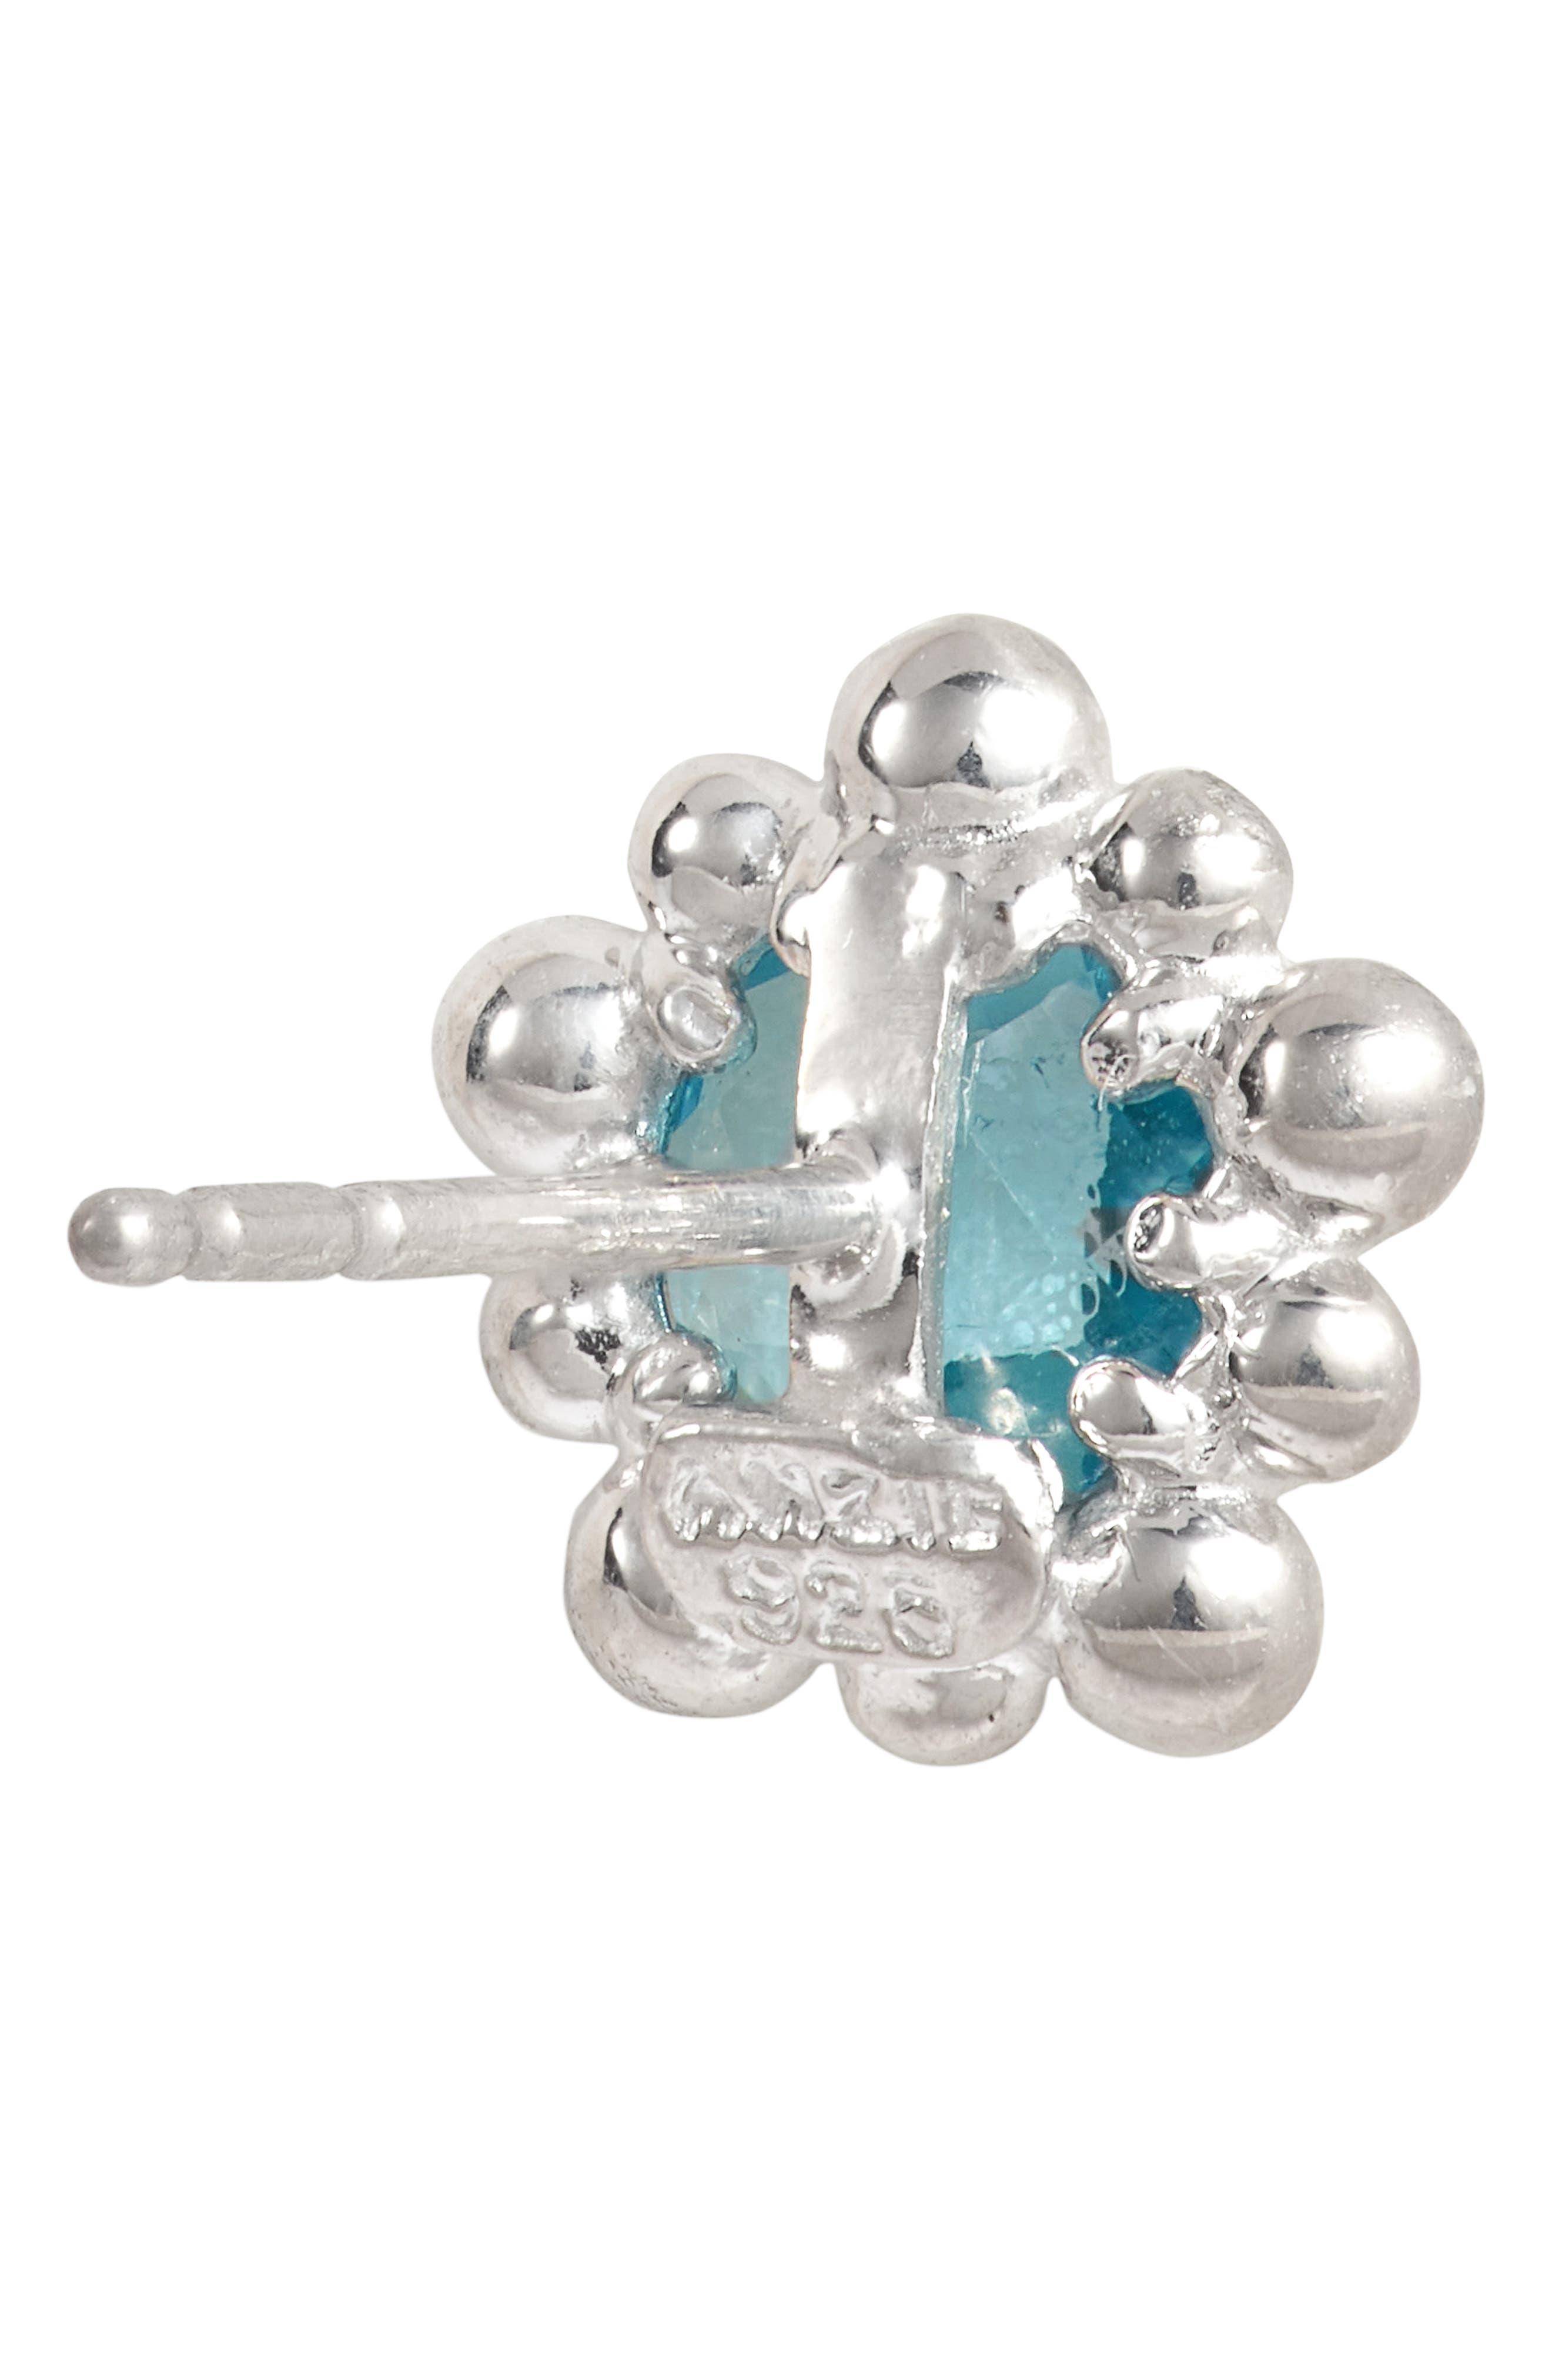 Micro Dew Drop Topaz Earrings,                             Alternate thumbnail 3, color,                             040